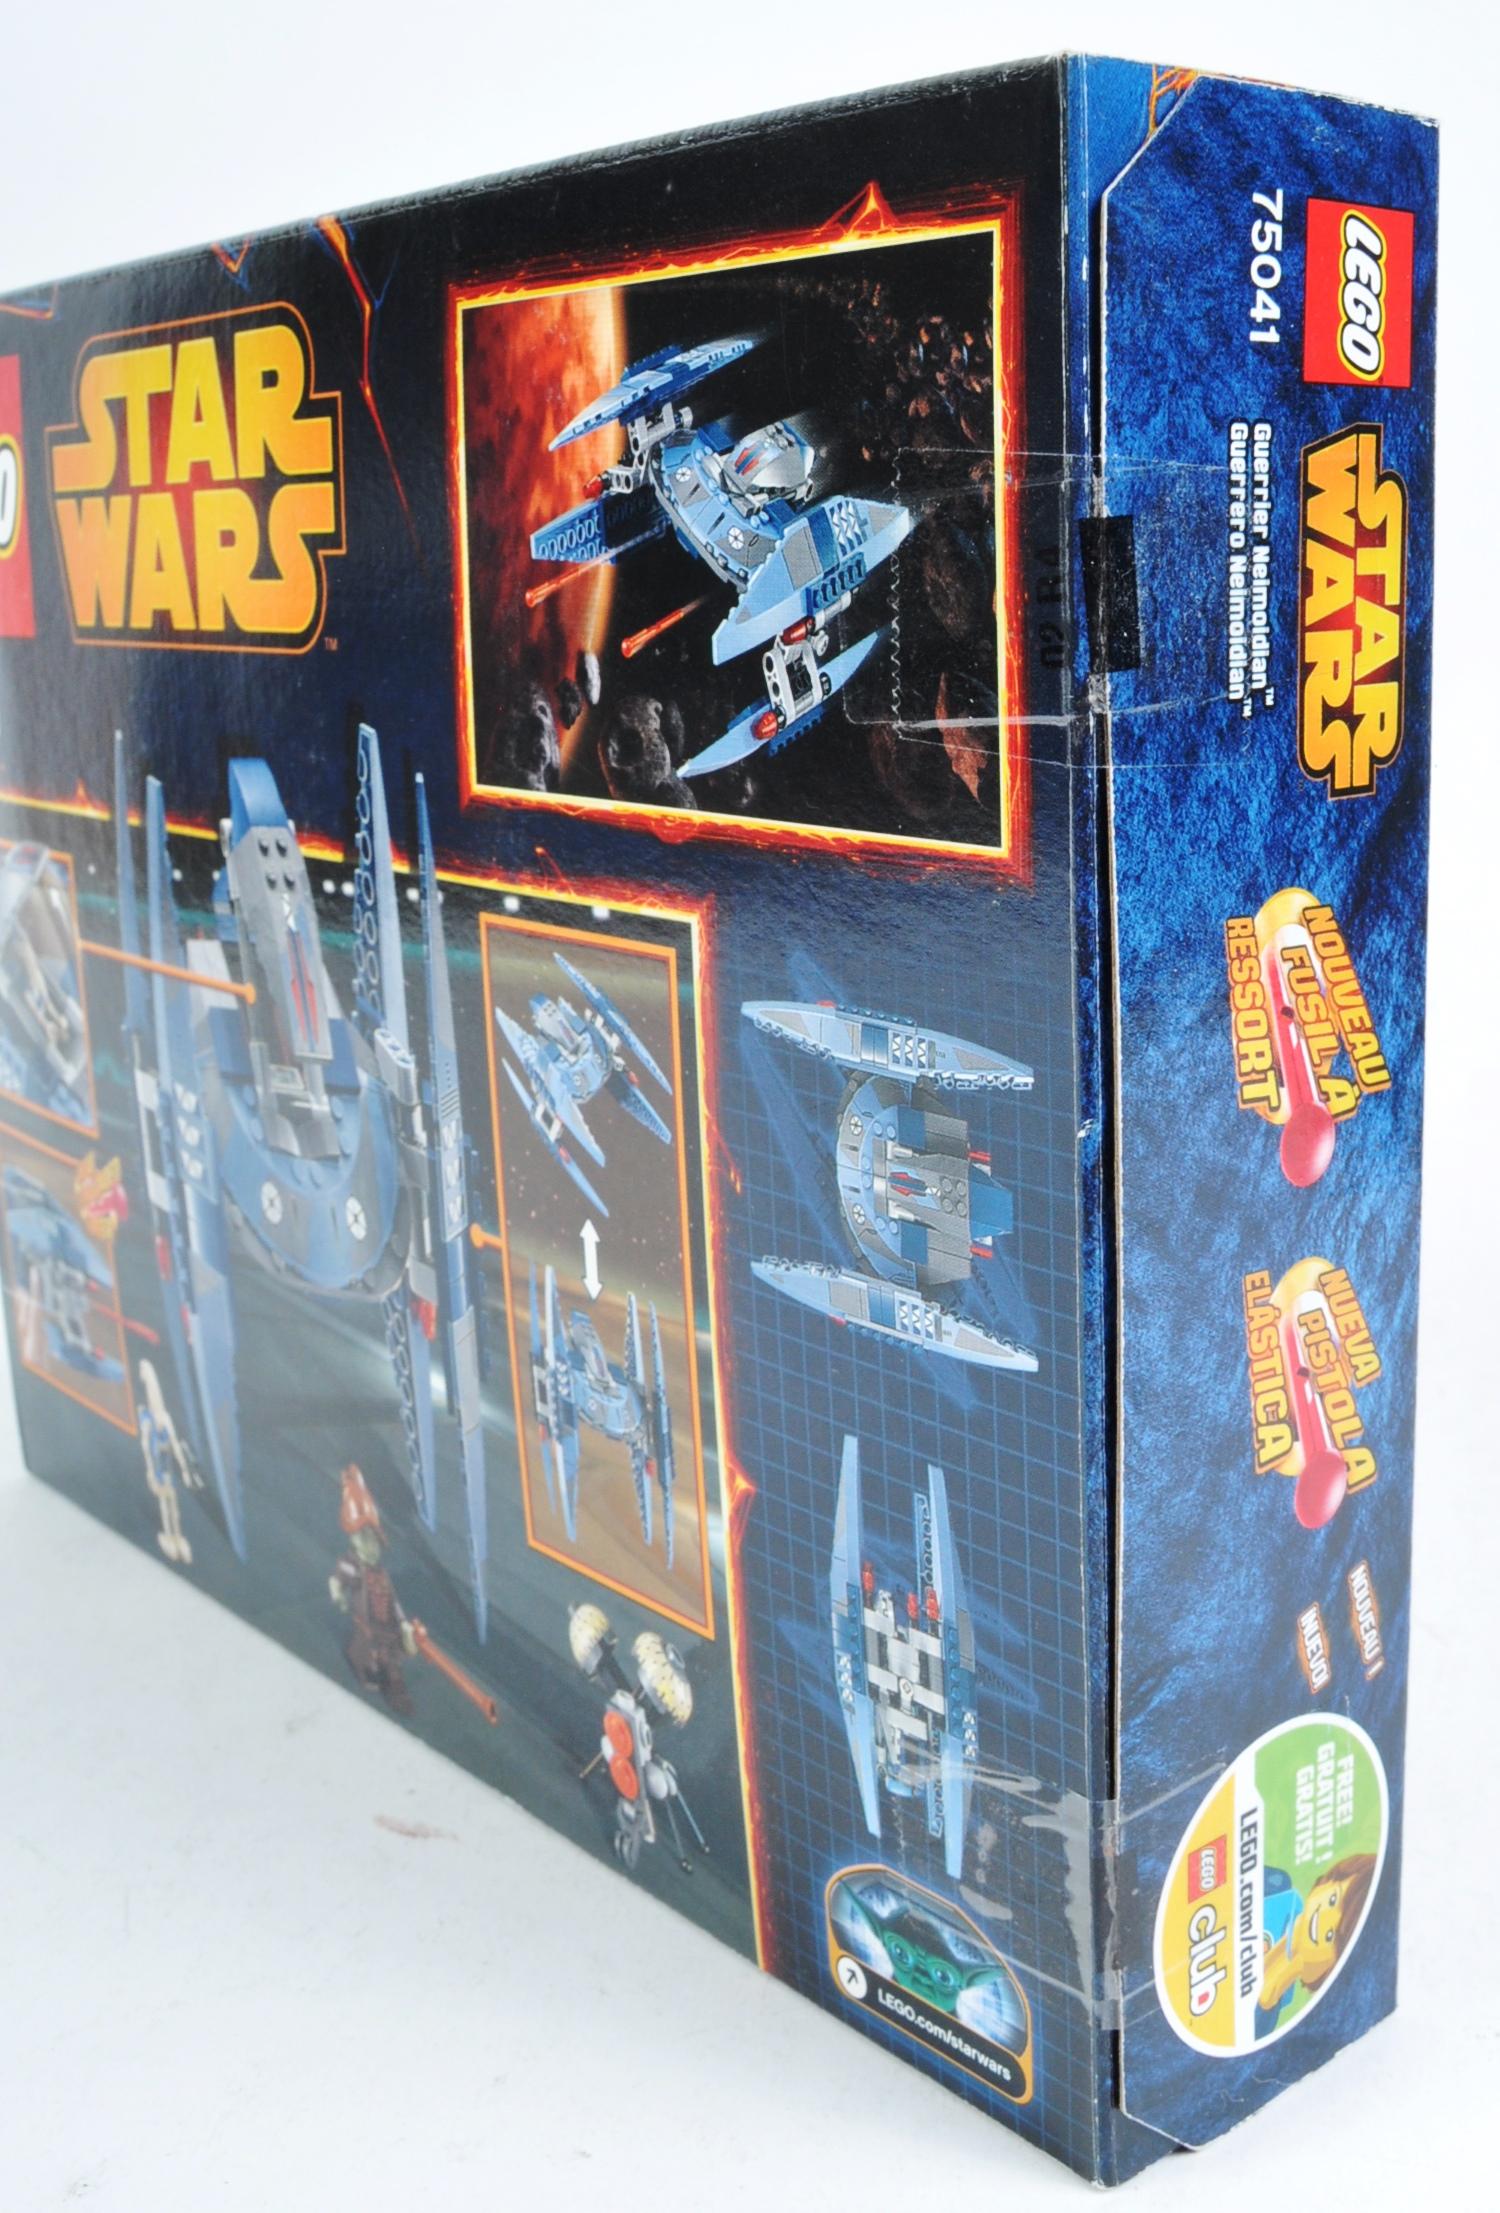 LEGO SETS - LEGO STAR WARS - 75041 / 75042 - Image 5 of 6